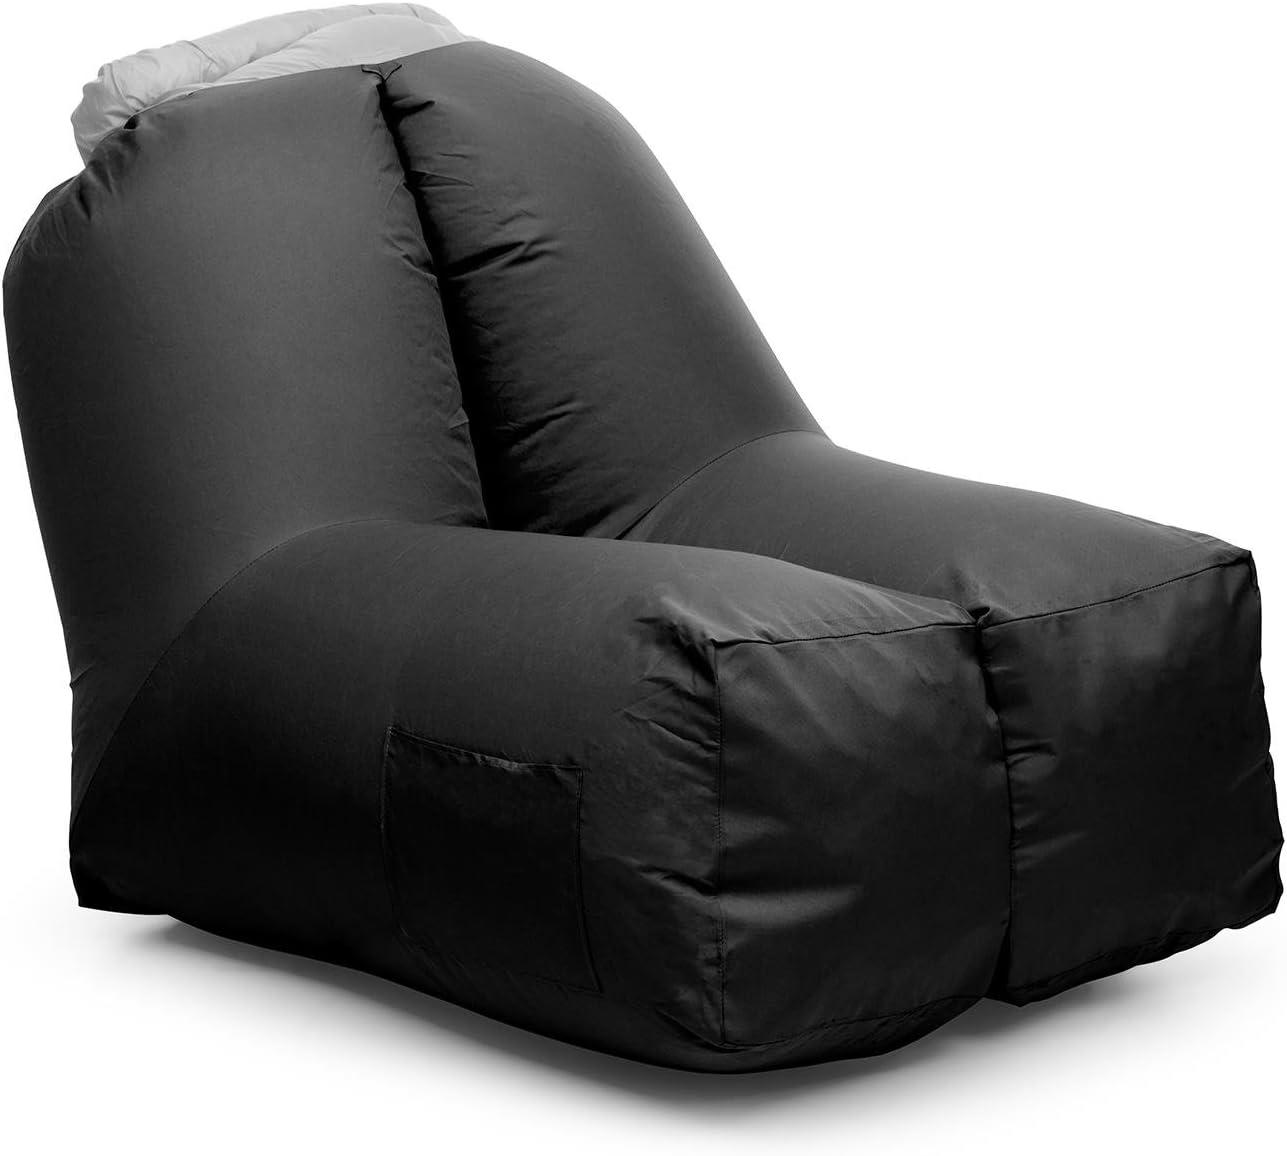 Blumfeldt Airchair - Sillón Inflable, Sillón Hinchable, Camping, Playa, Piscina, Viaje, Impermeable, Resistente, Cómodo, Dimensiones: 80x80x100cm, Negro